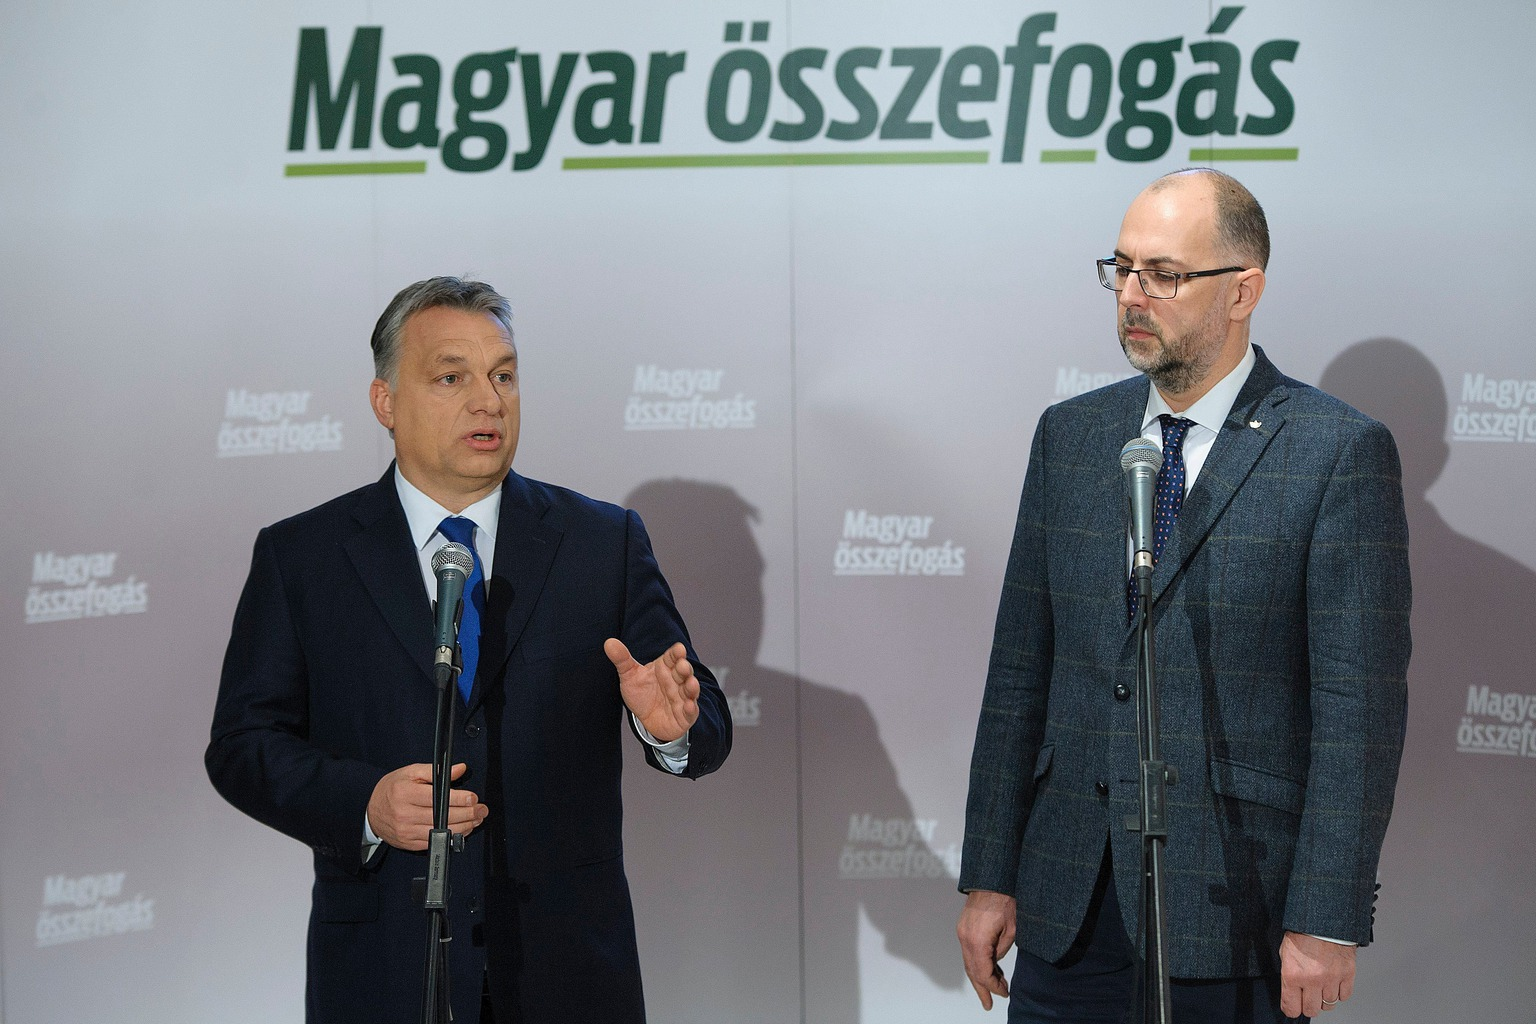 ciolos-kifogasolja-a-magyar-miniszterelnok-kijelenteseit.jpg